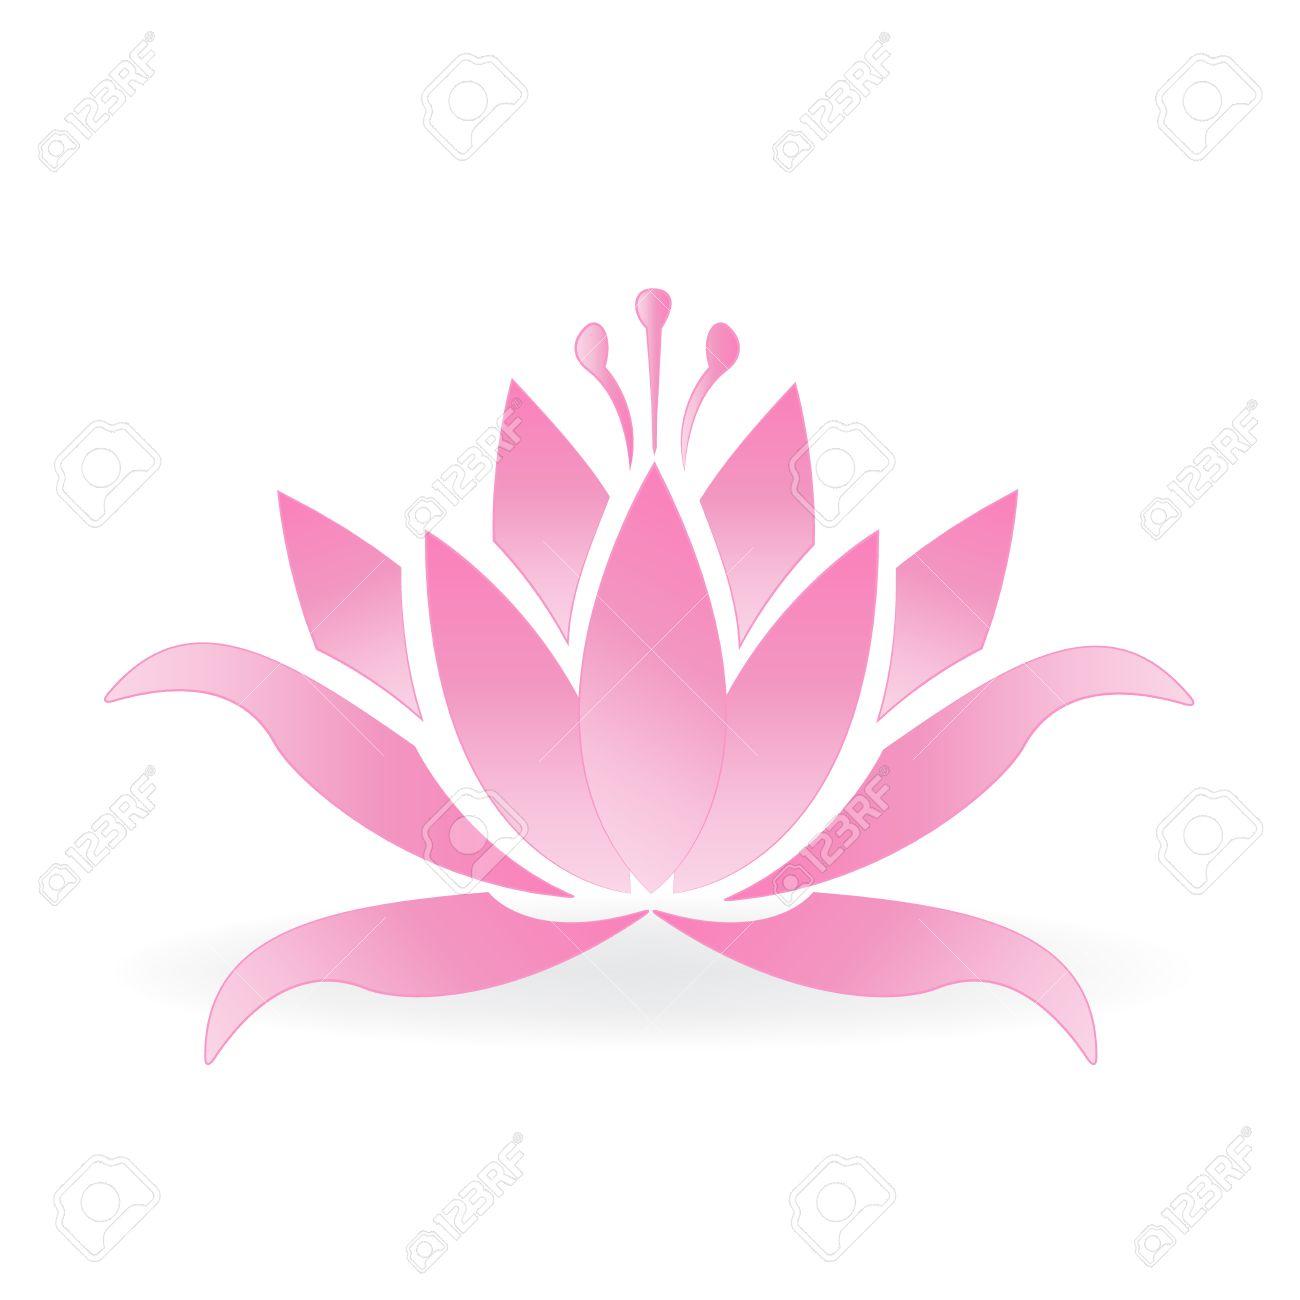 Pink lotus flower logo icon vector design royalty free cliparts pink lotus flower logo icon vector design stock vector 75504912 mightylinksfo